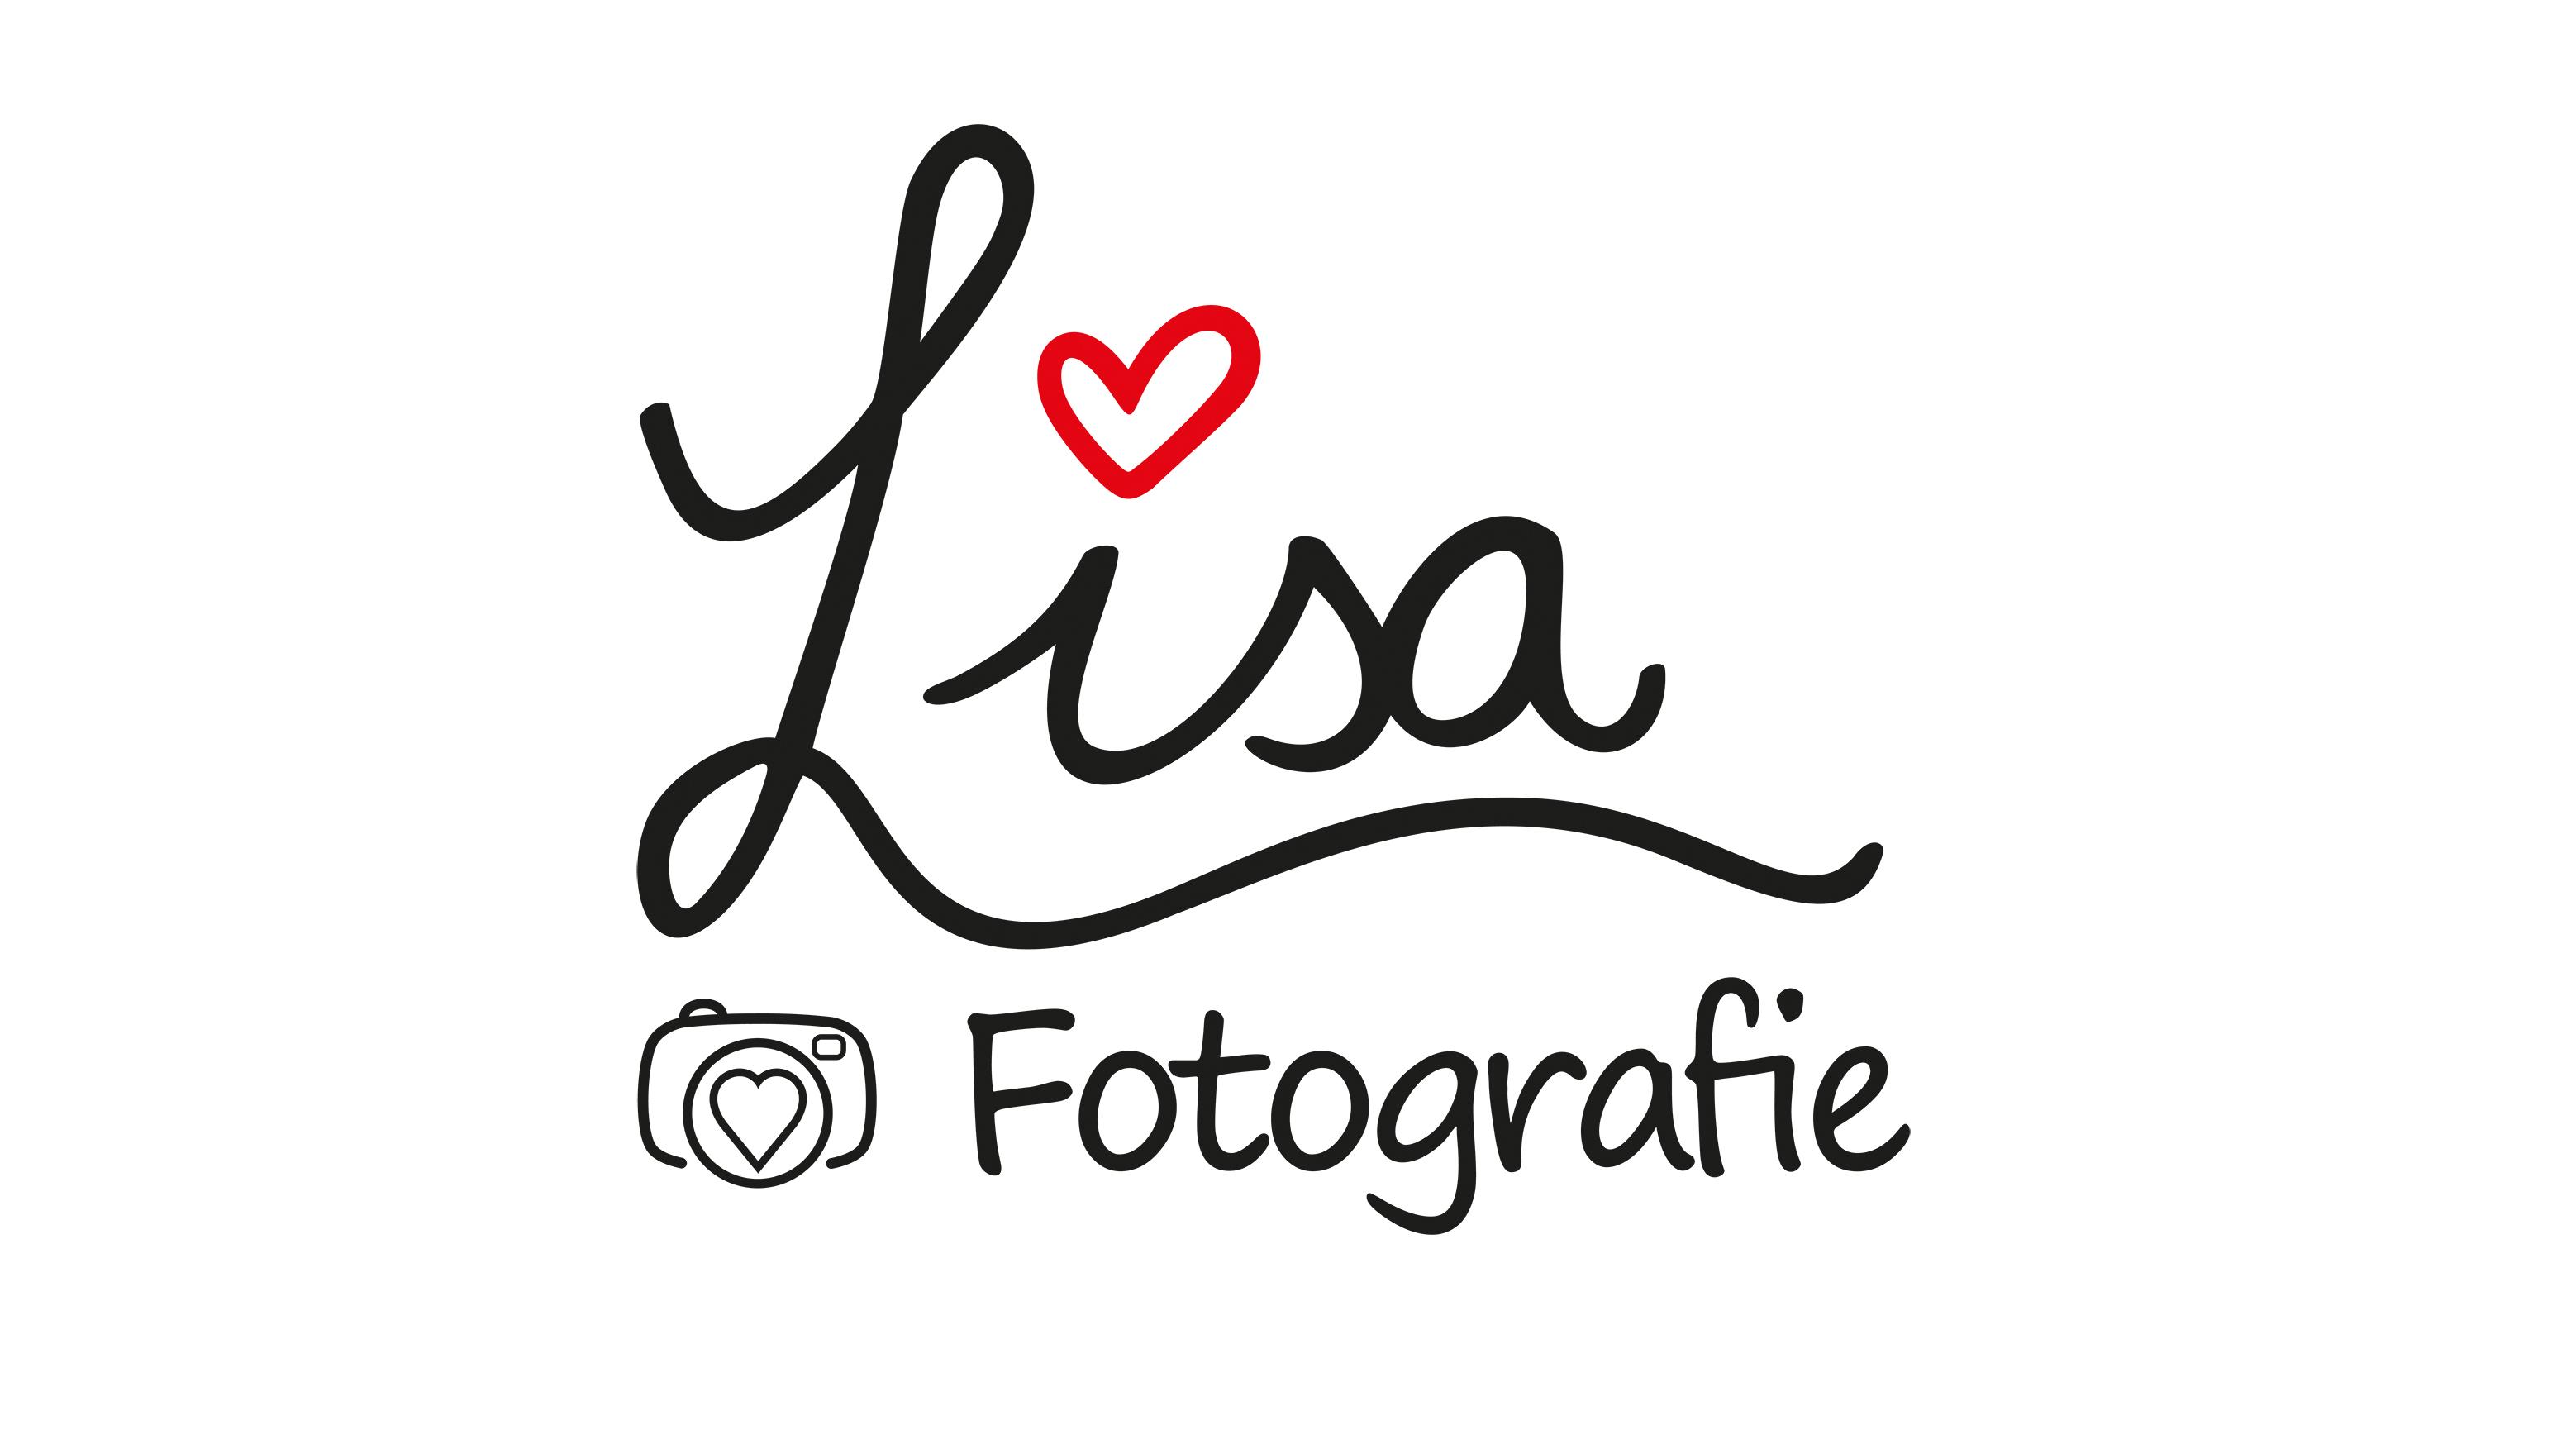 lisa fotografie rechthoek kleinerr